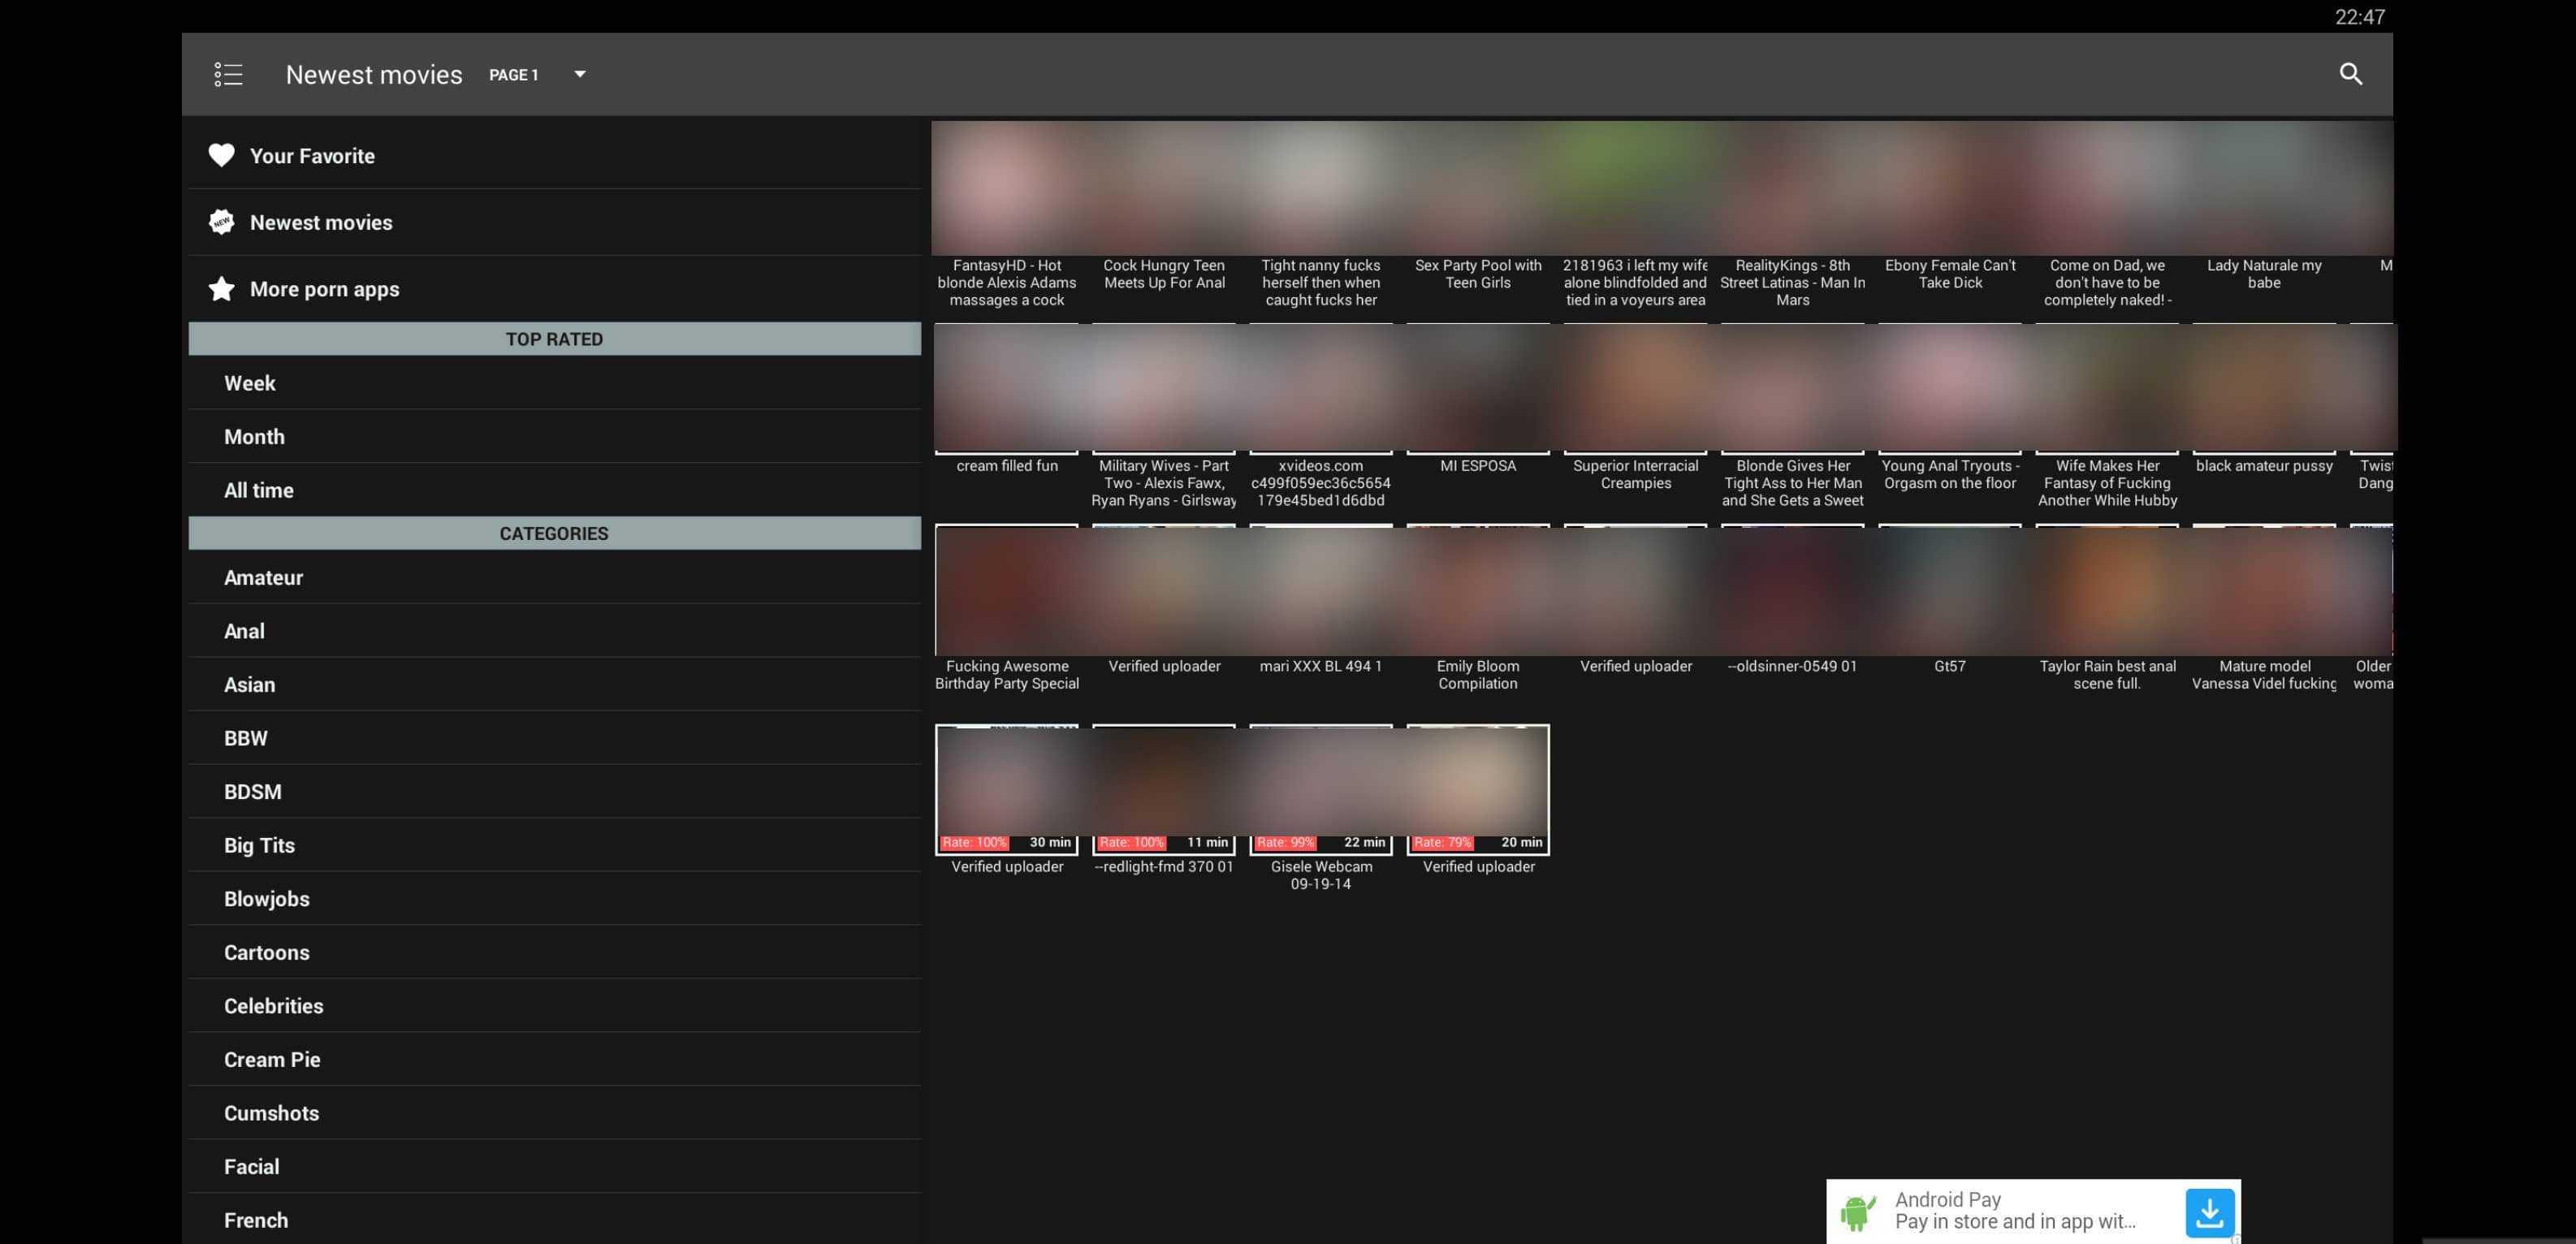 Application Porn xmovie apk: app summary and download links